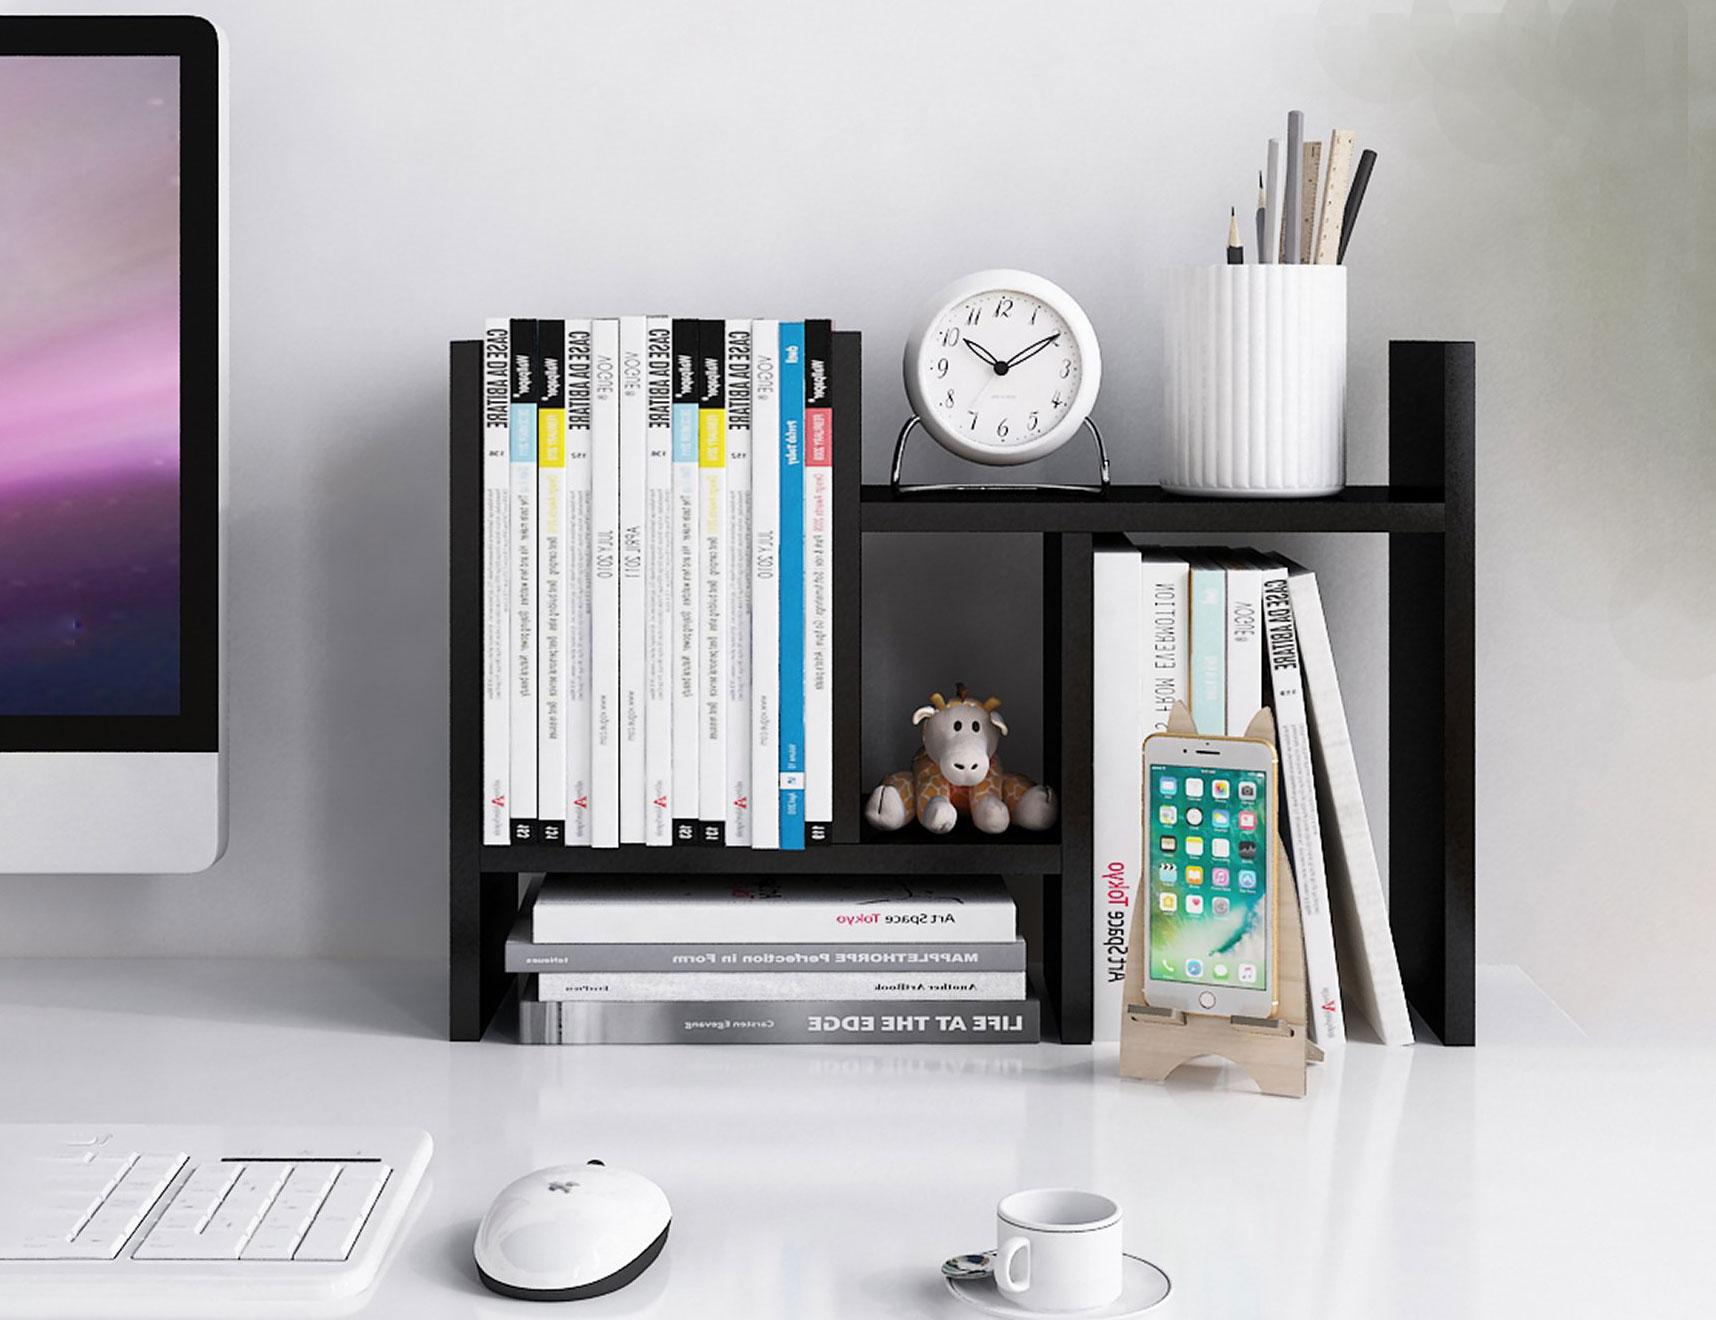 The 15 Best Desk Shelves For Home Offices Dorm Rooms In 2020 Spy